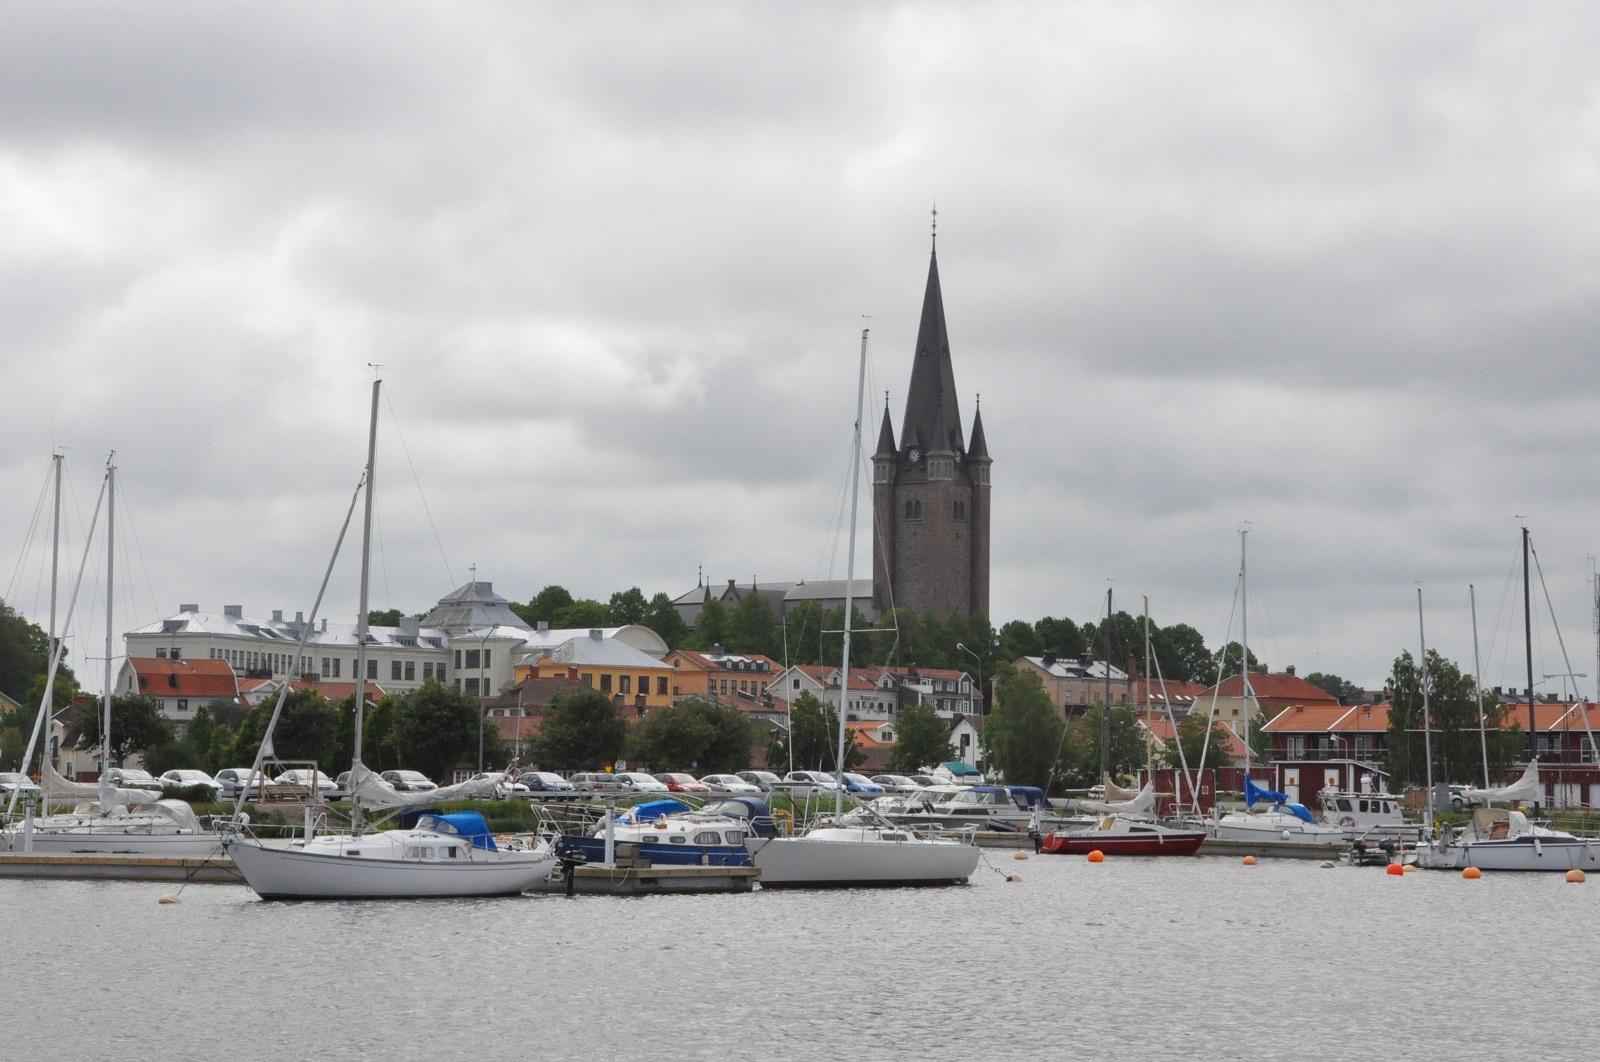 41_Mariestad1